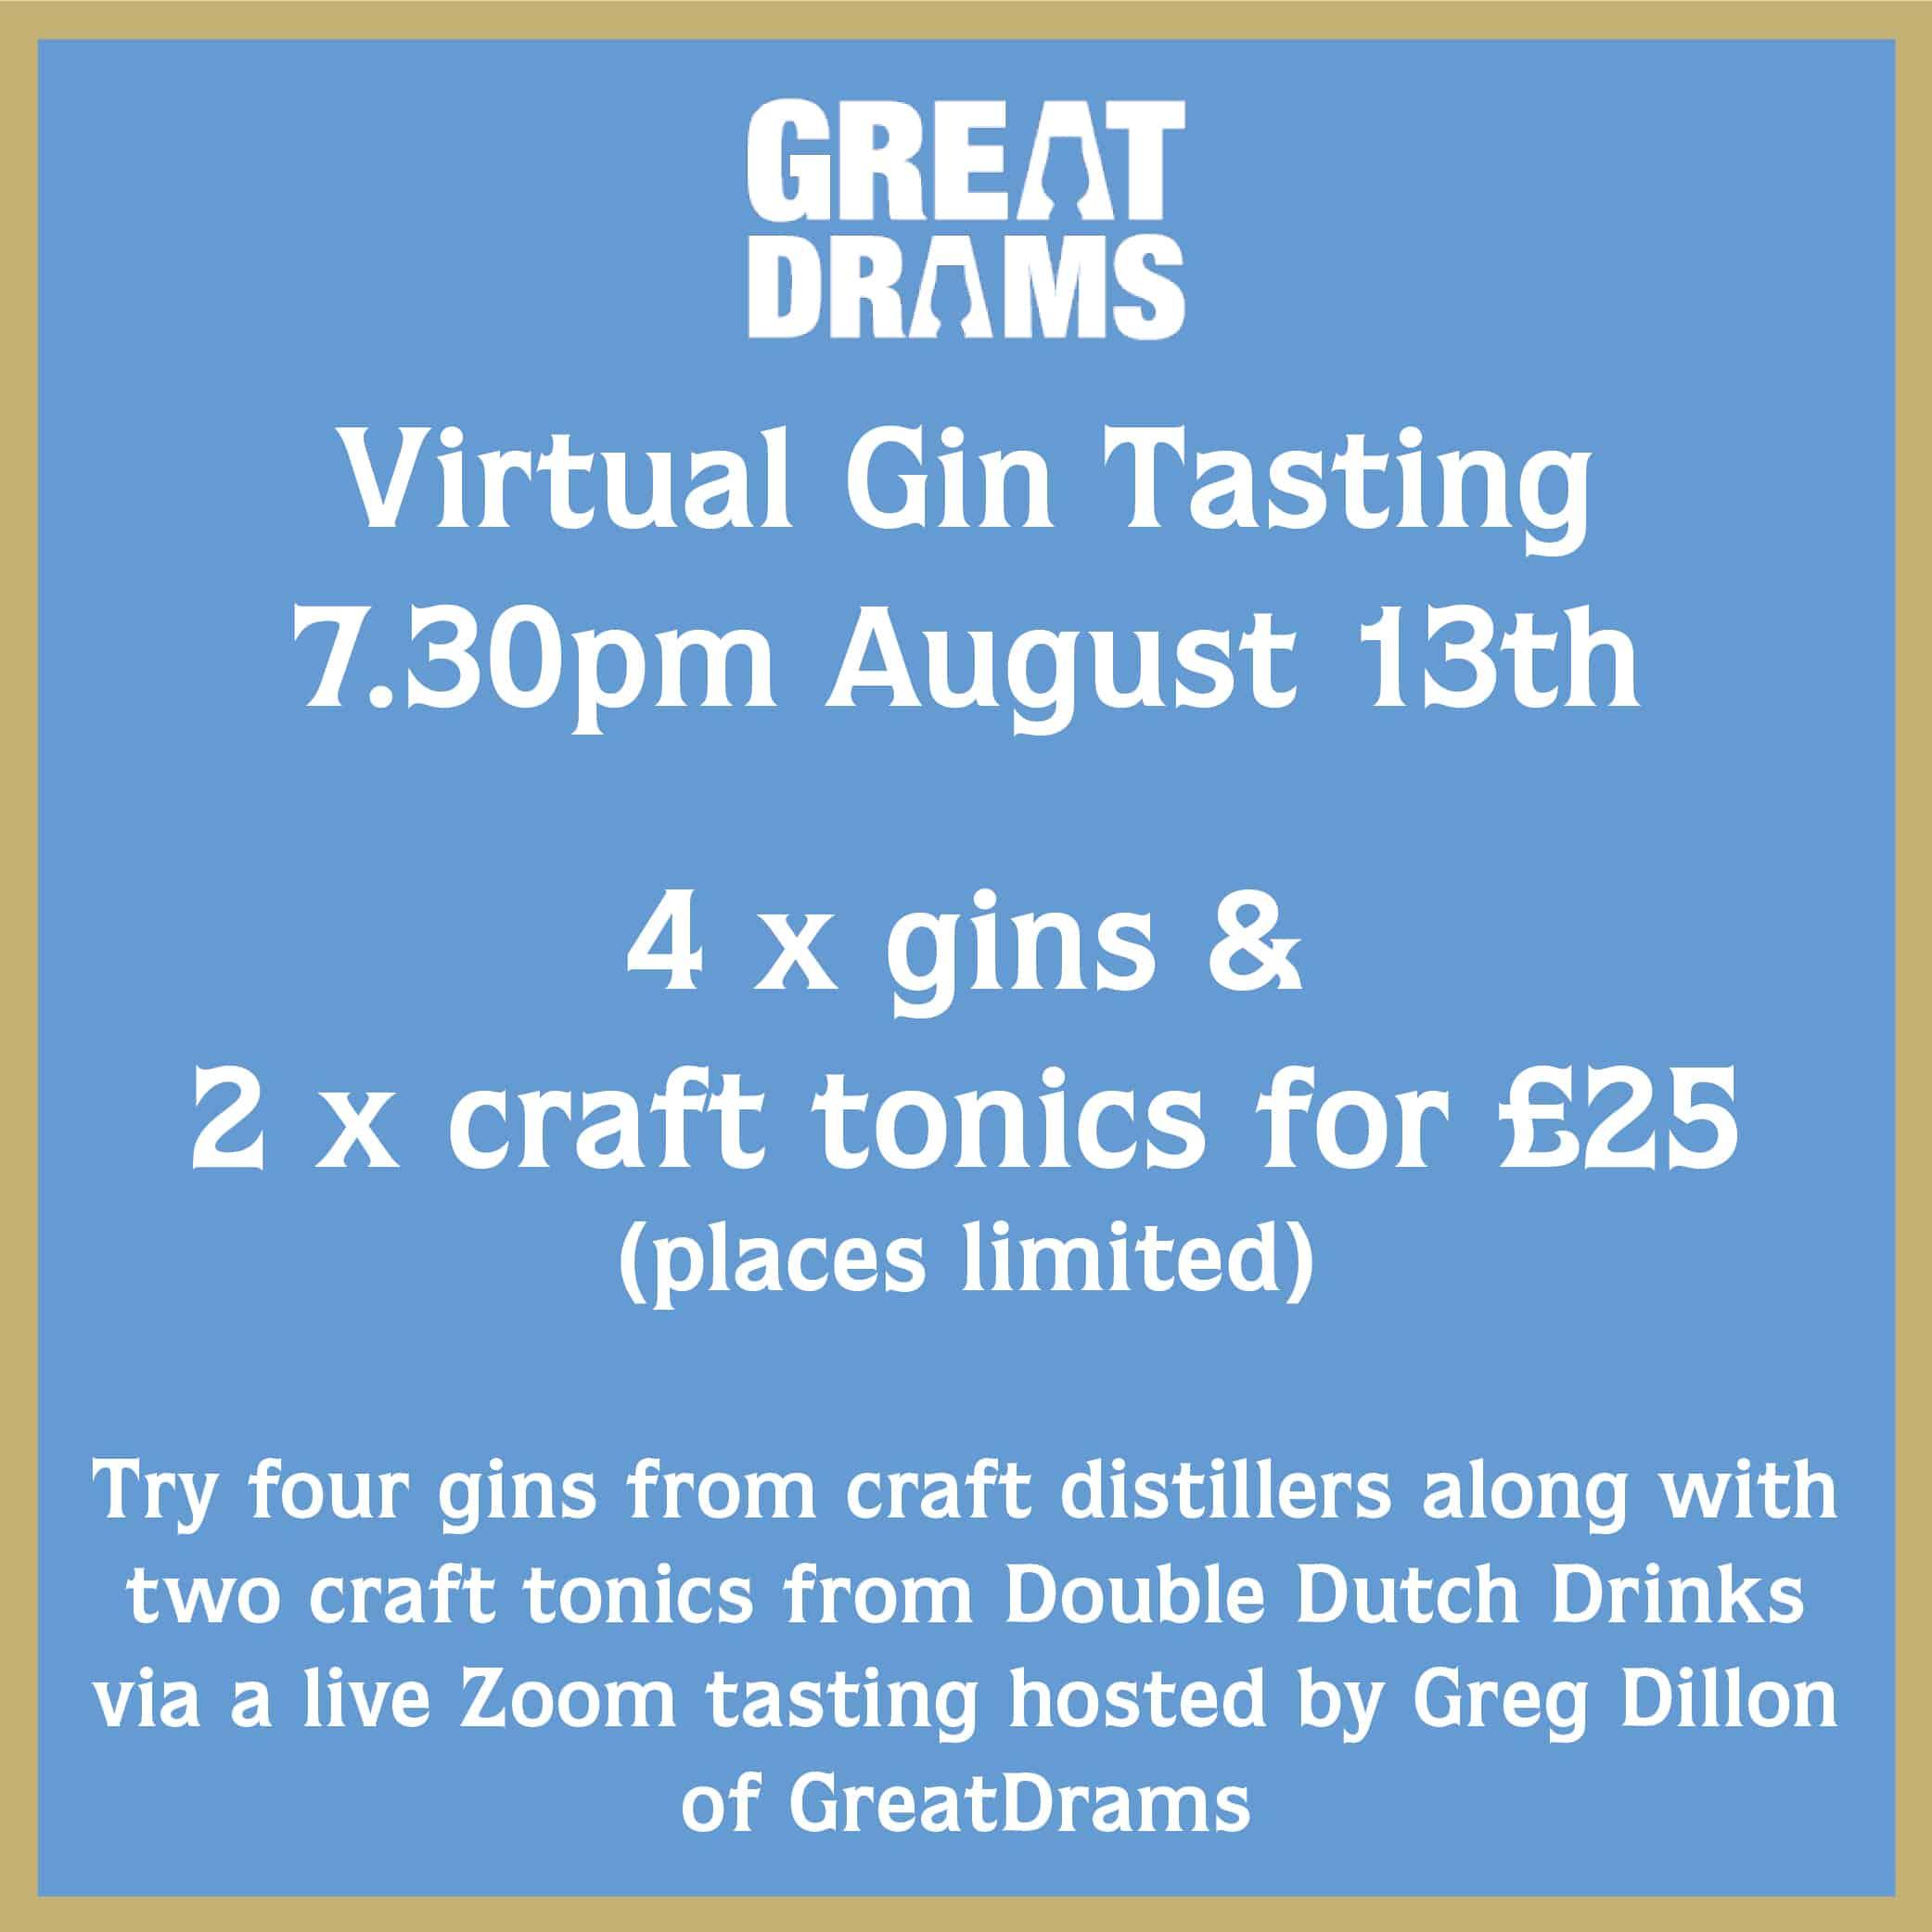 Virtual Gin Tasting